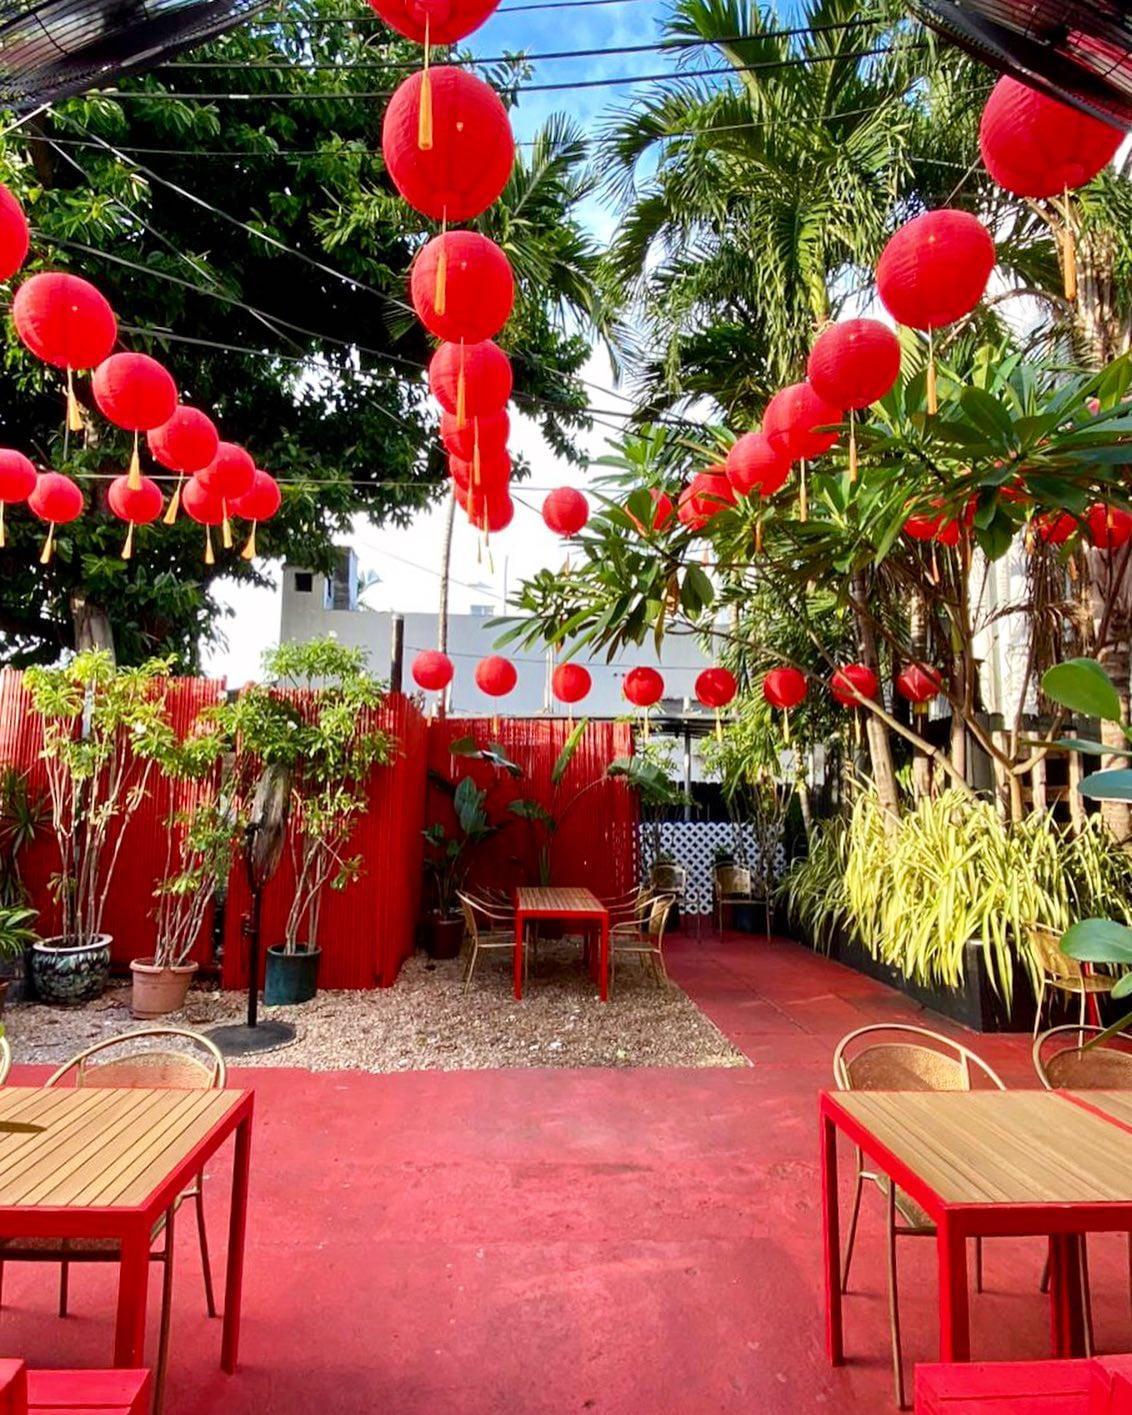 Phuc Yea MiMo Miami Historic District Hidden Gem REstaurant for Brunch